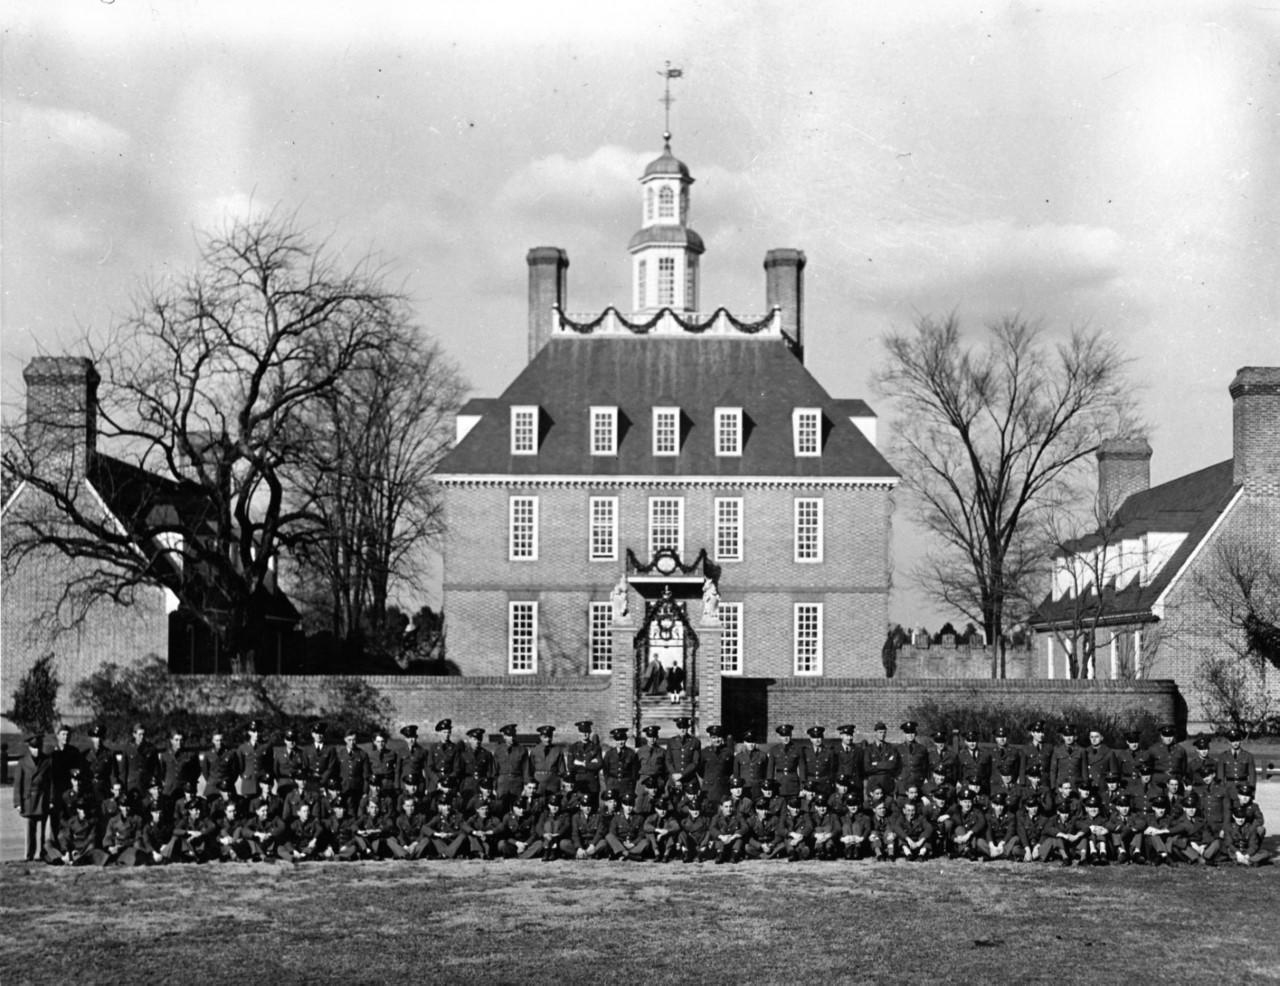 World War II-Era Colonial Williamsburg